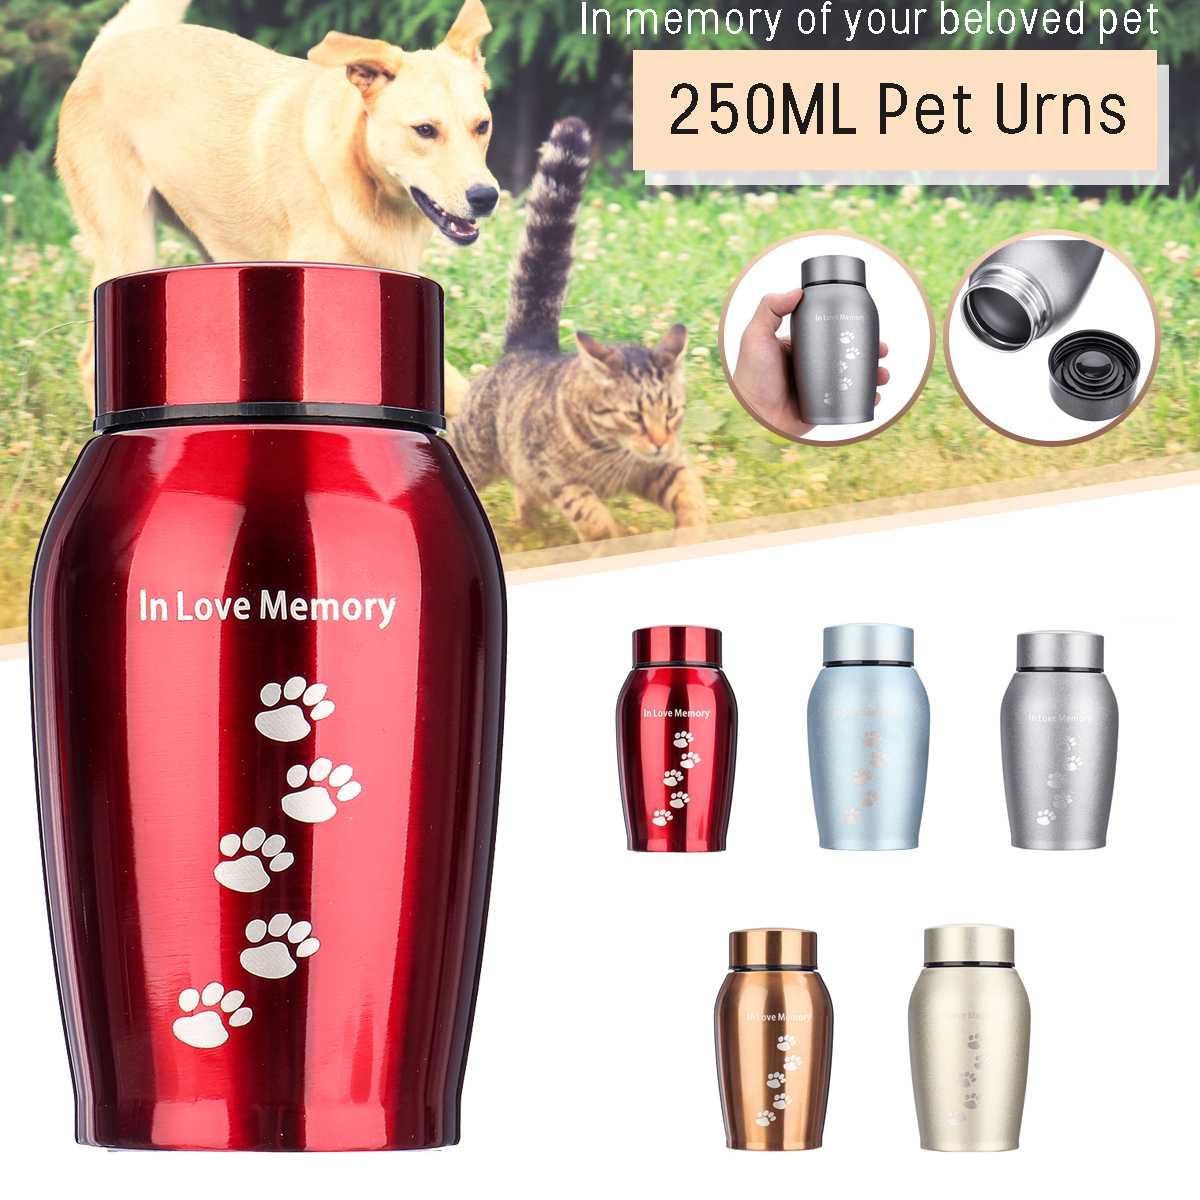 5 Colors Stainless steel Urns Pets Dog Cat Birds Mouse Cremation Ashes Urn Keepsake Casket Columbarium Pets Memorials 250ML